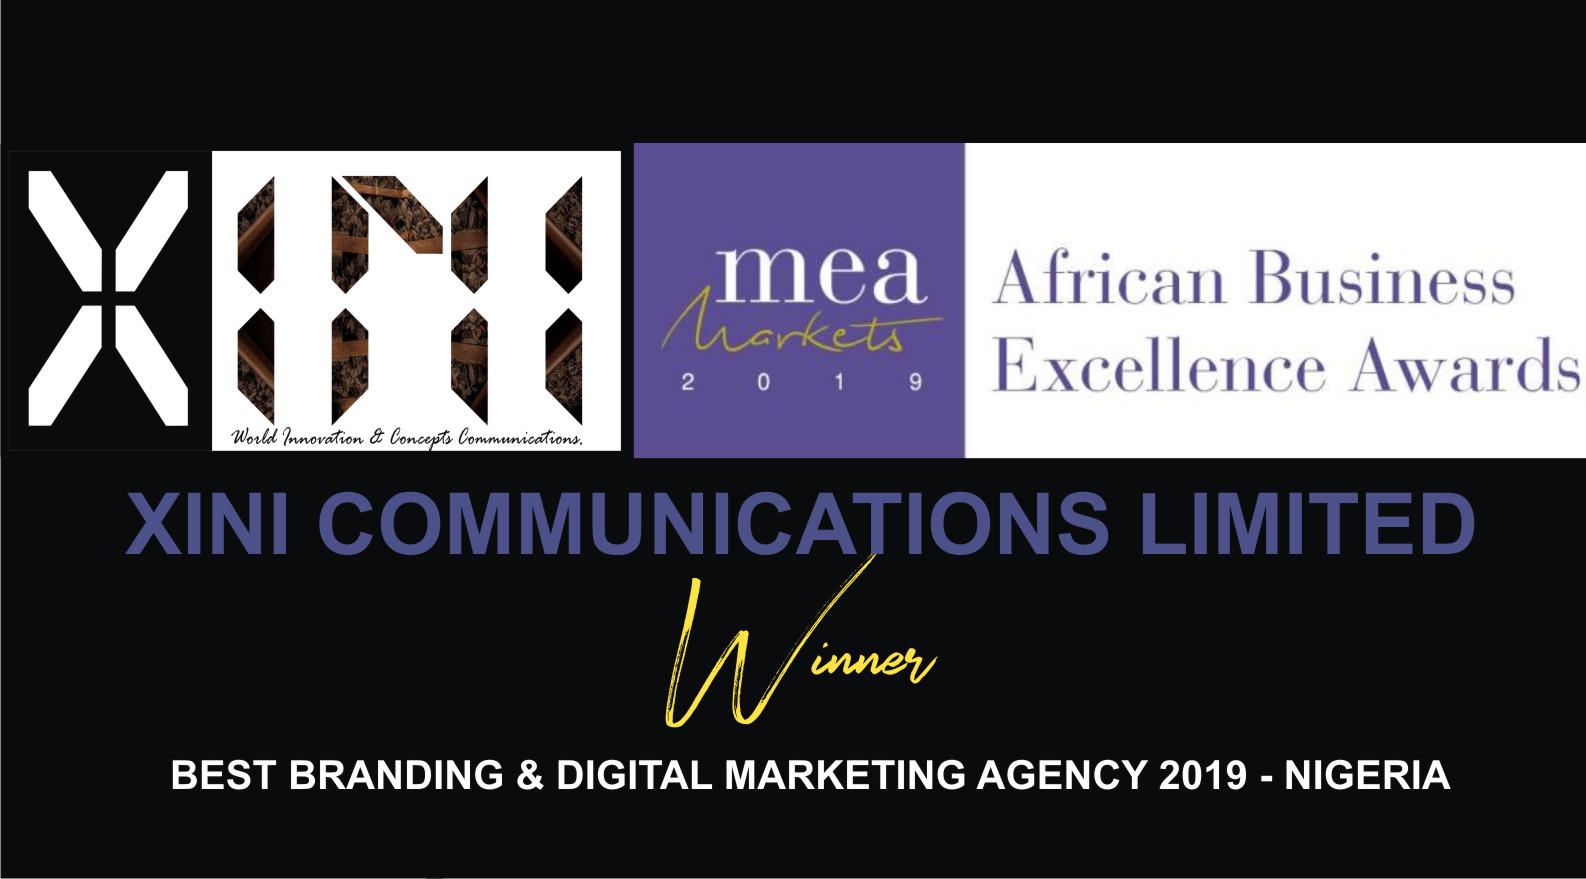 MEA BEST BRANDING AND DIGITAL MARKETING AGENCY 2019 IN